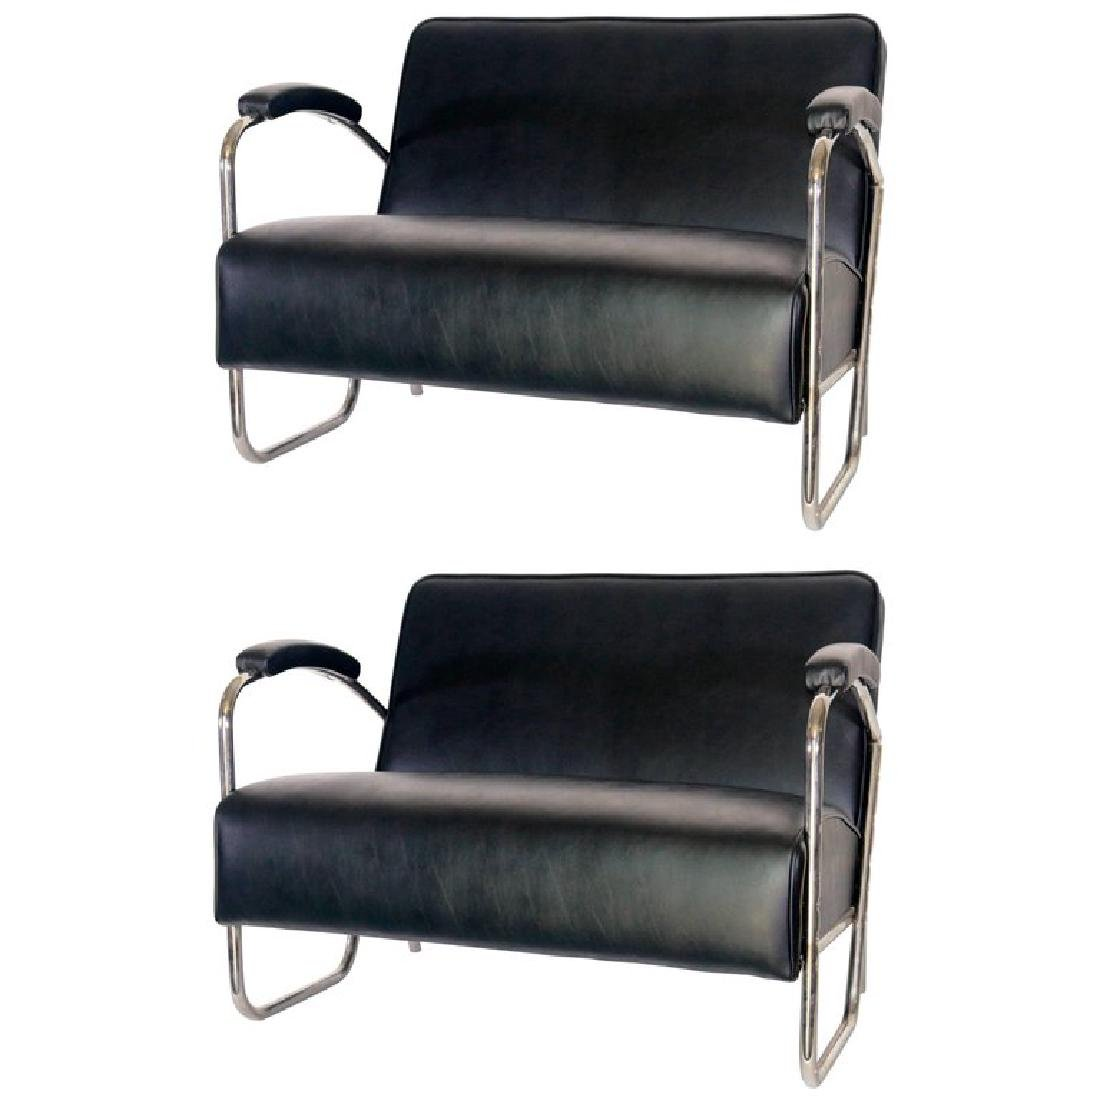 Pair of Mid-Century Modern Thonet Style Sattees Sofas